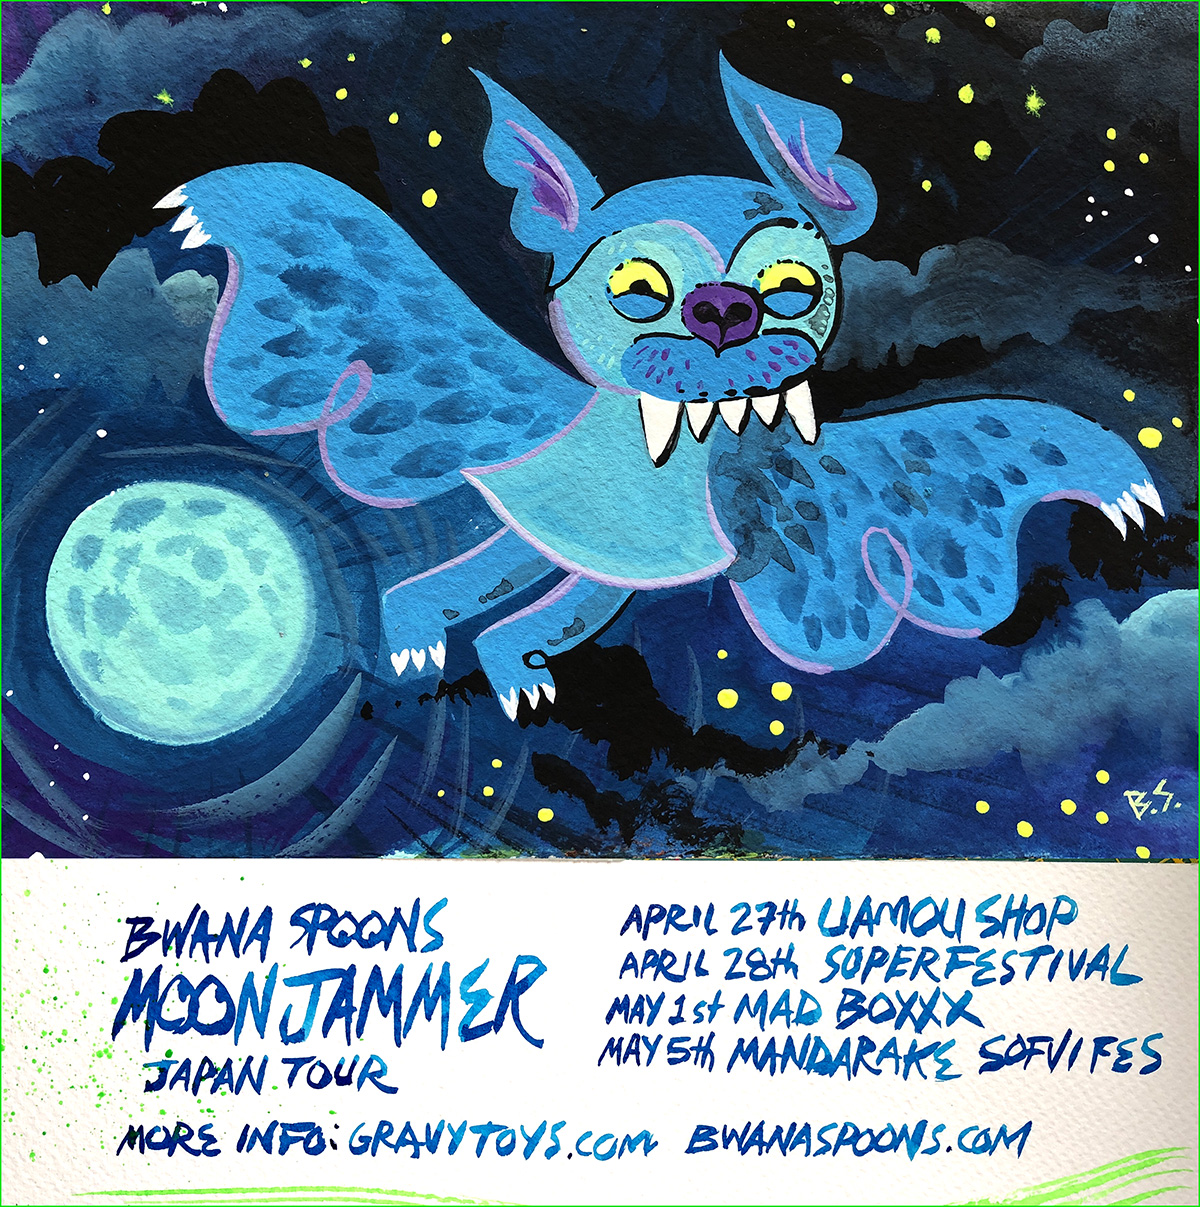 moon jammer flyer01web.jpg